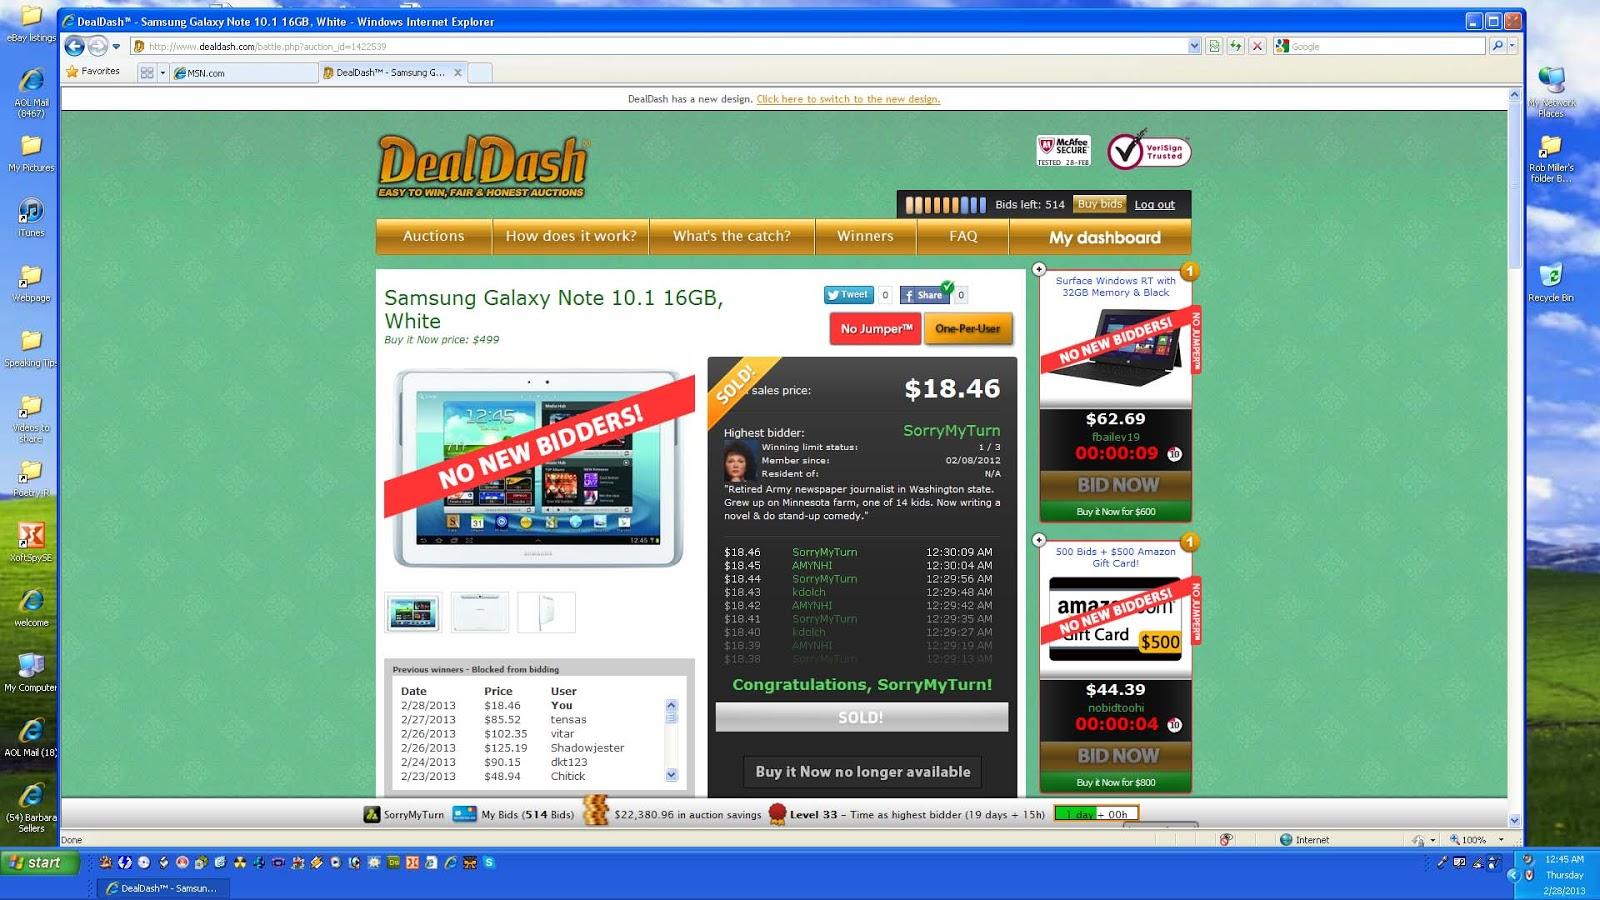 DealDash Shopping Learn New Winning Strategies on